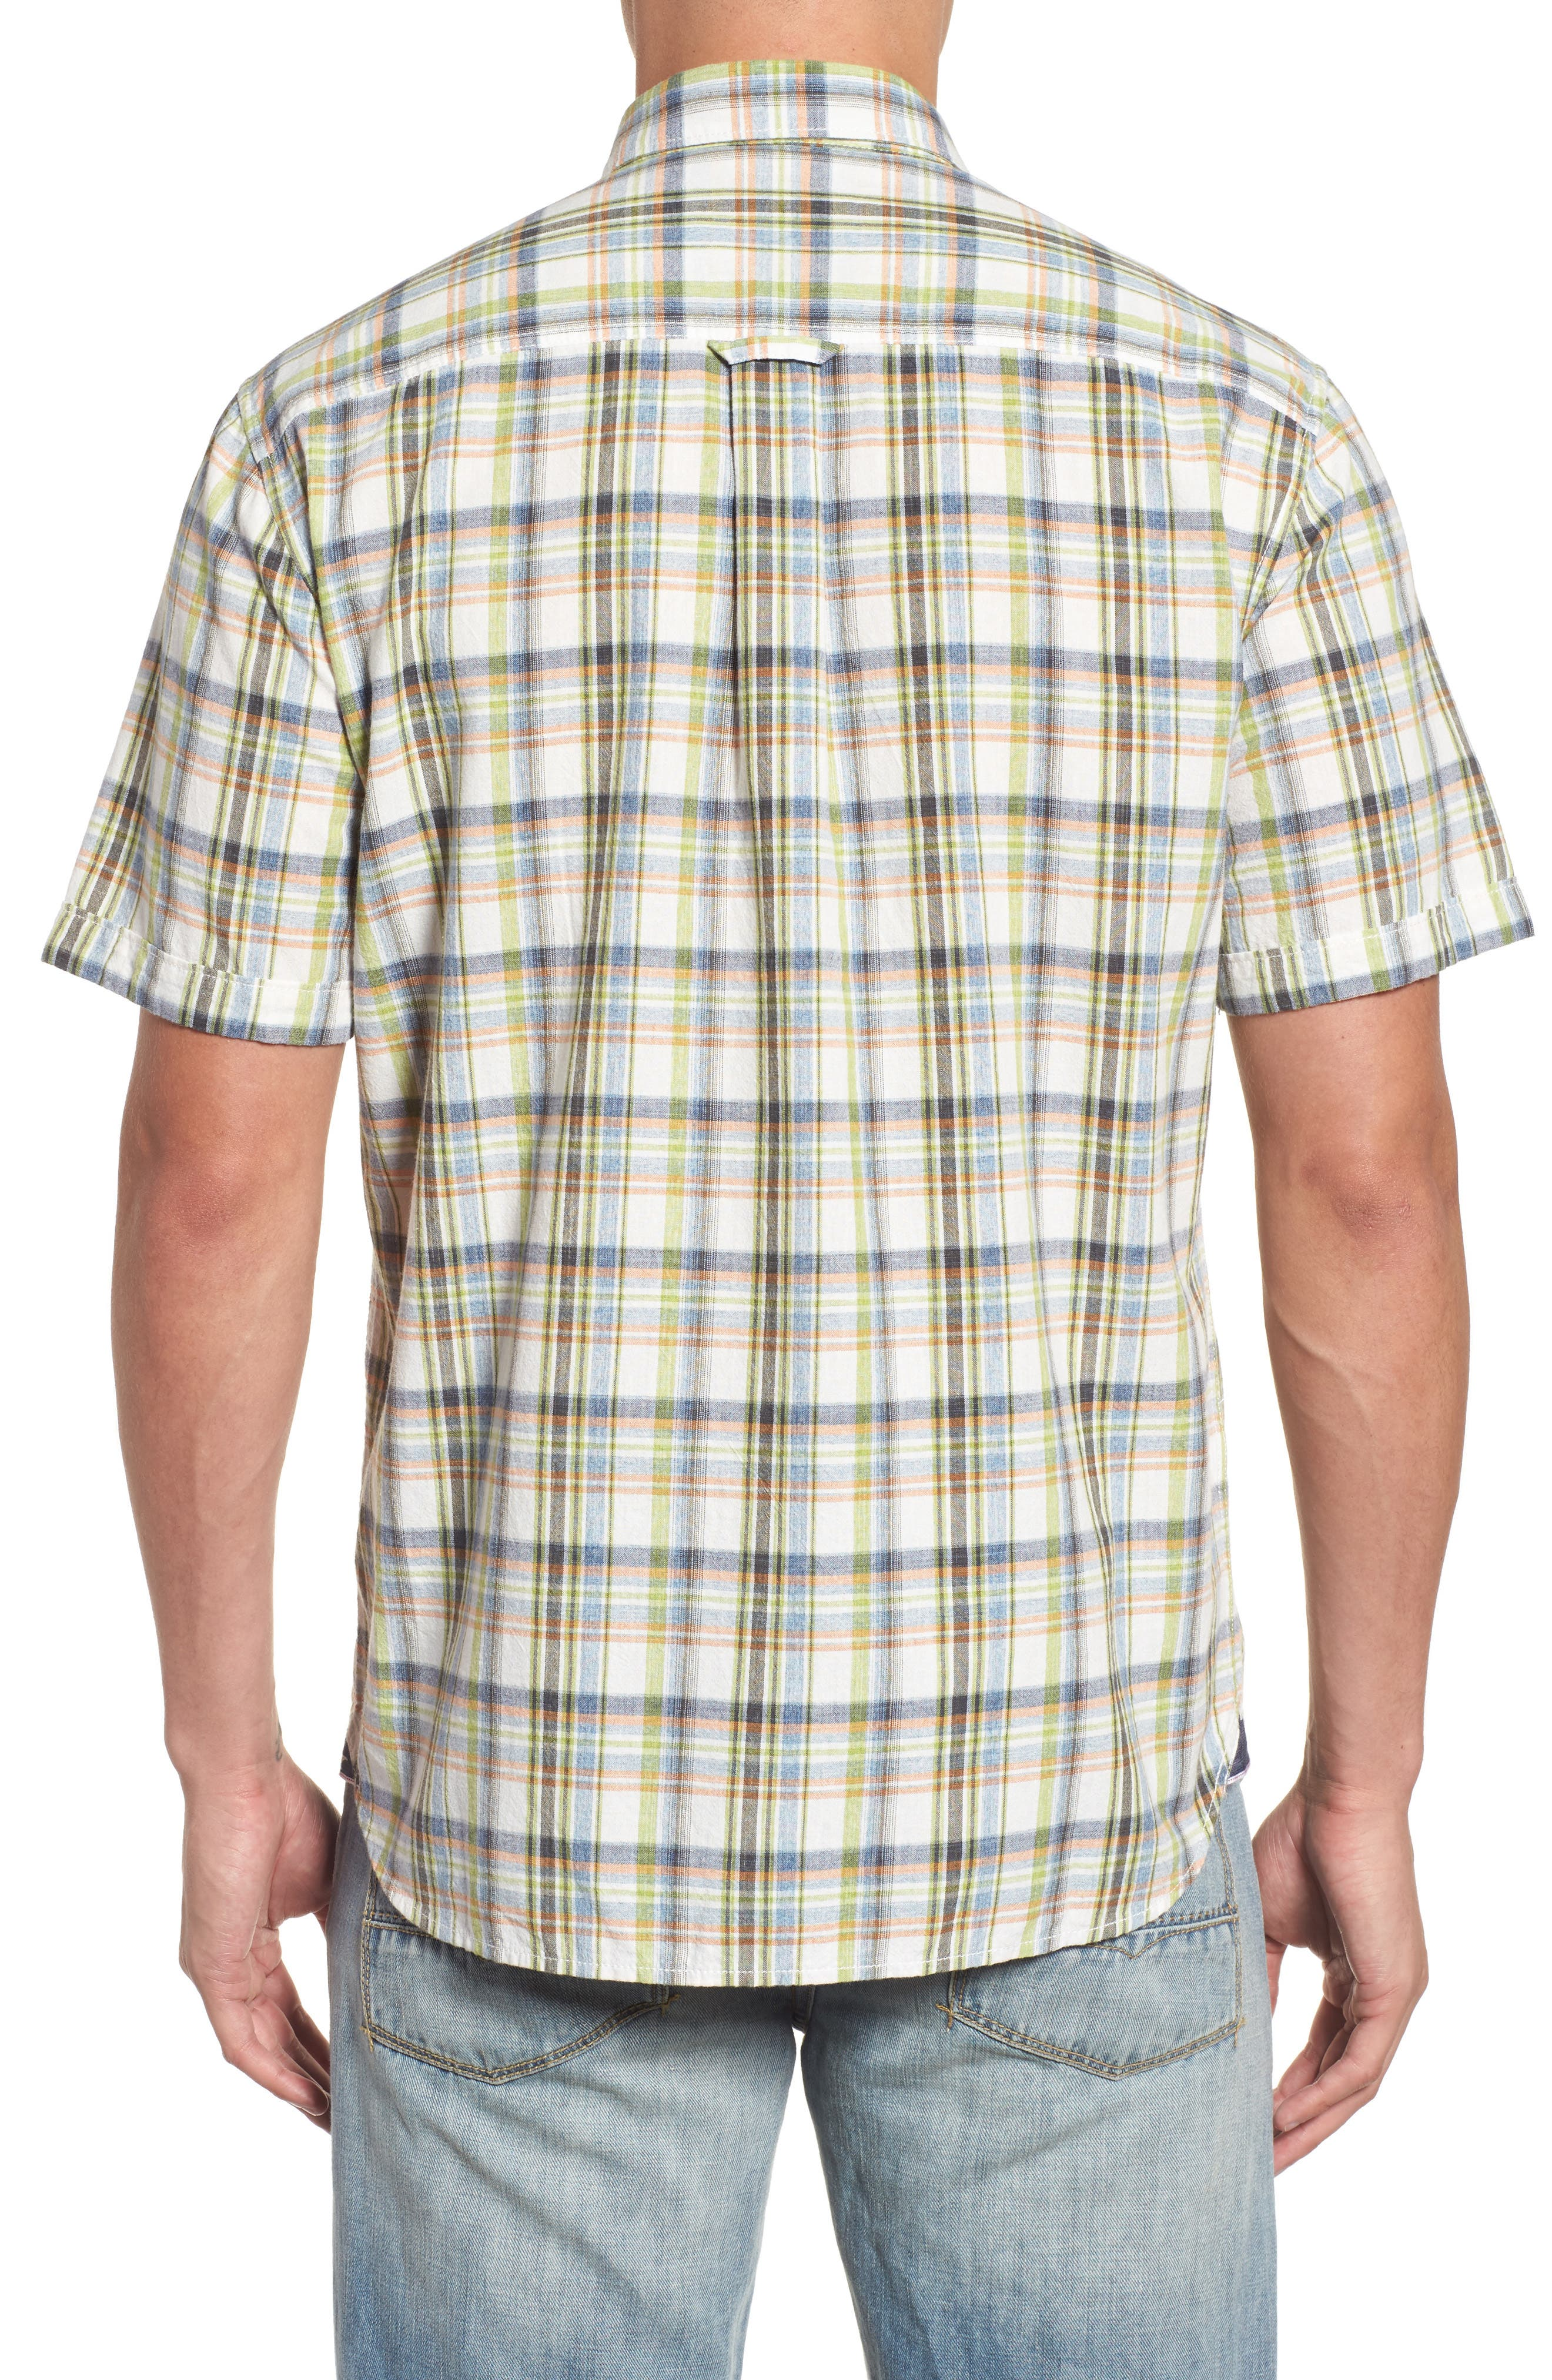 Ocean Cay Plaid Sport Shirt,                             Alternate thumbnail 2, color,                             300